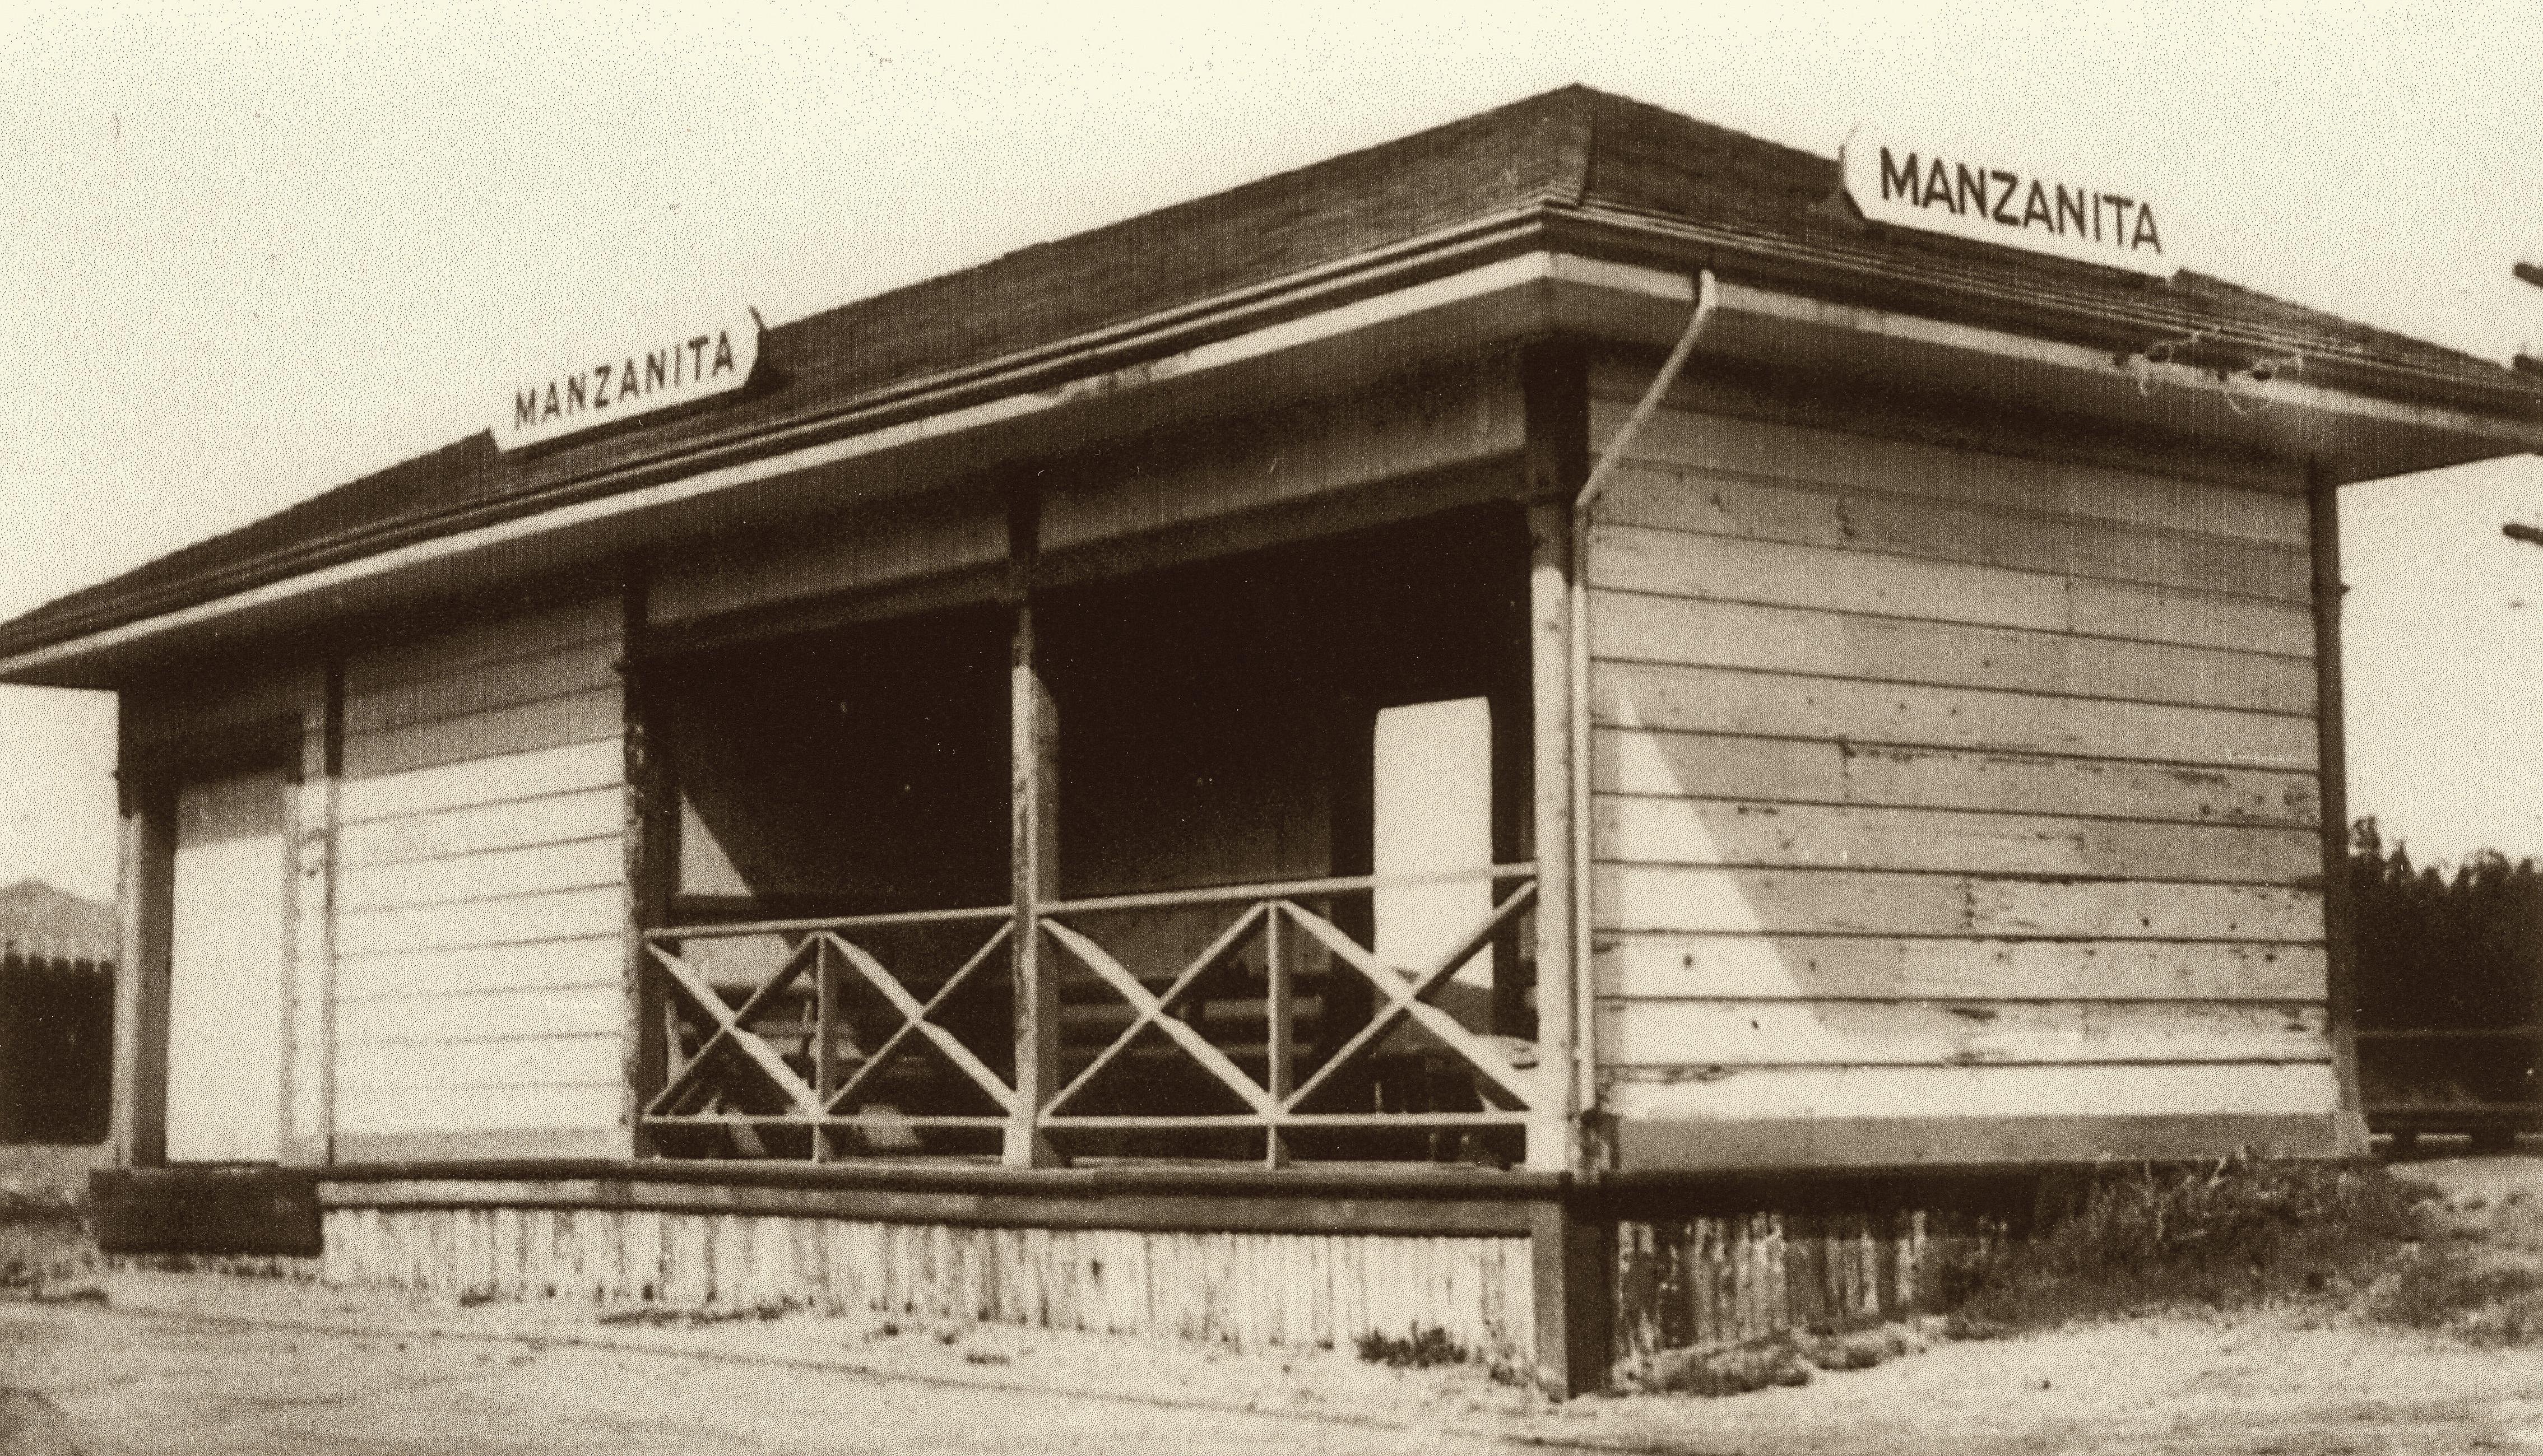 Manzanita (courtesy of Fred Codoni)